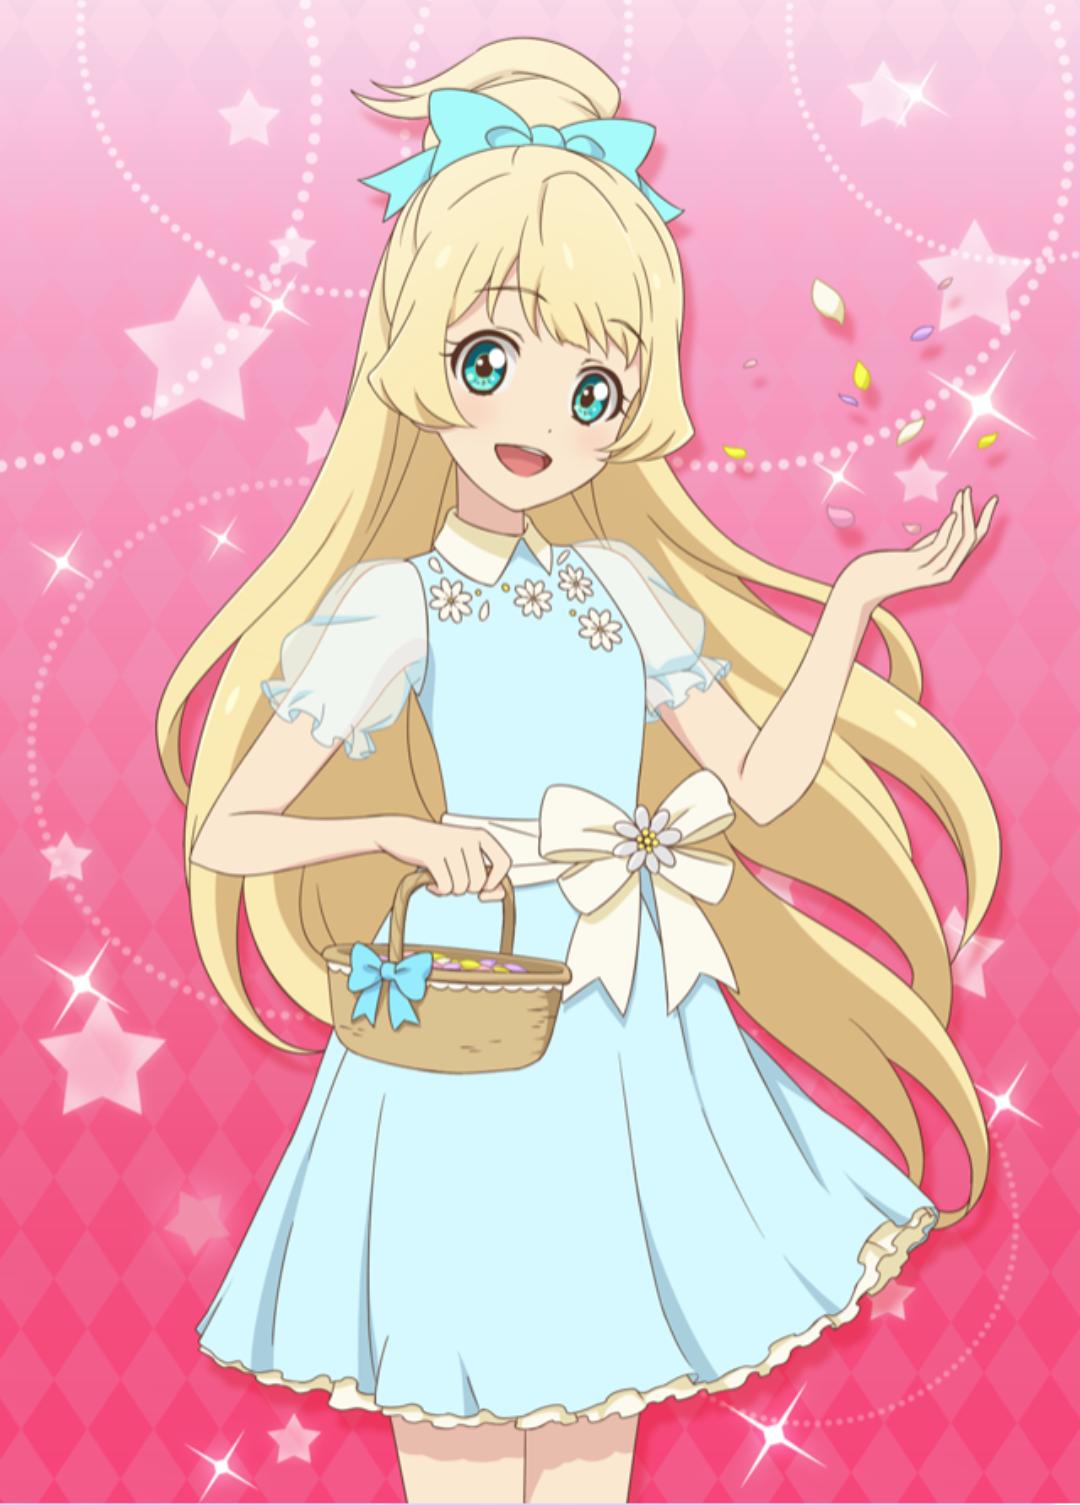 Aikatsu STARS [Wings of STARS]! Hime Aikatsu STARS